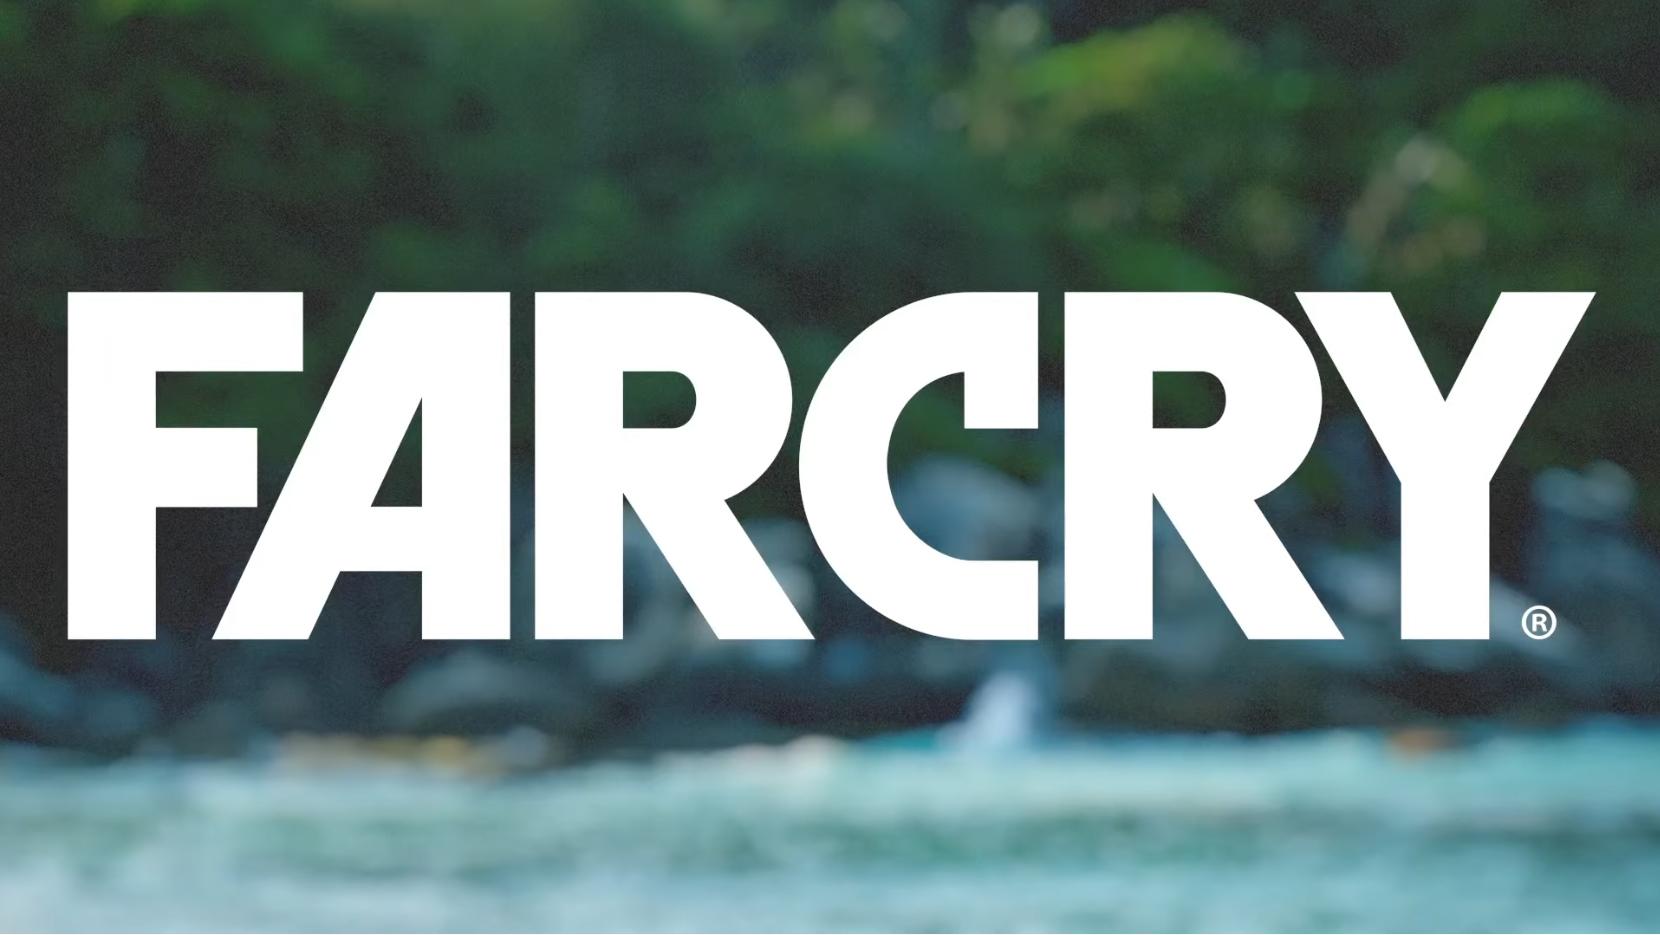 The Far Cry logo.